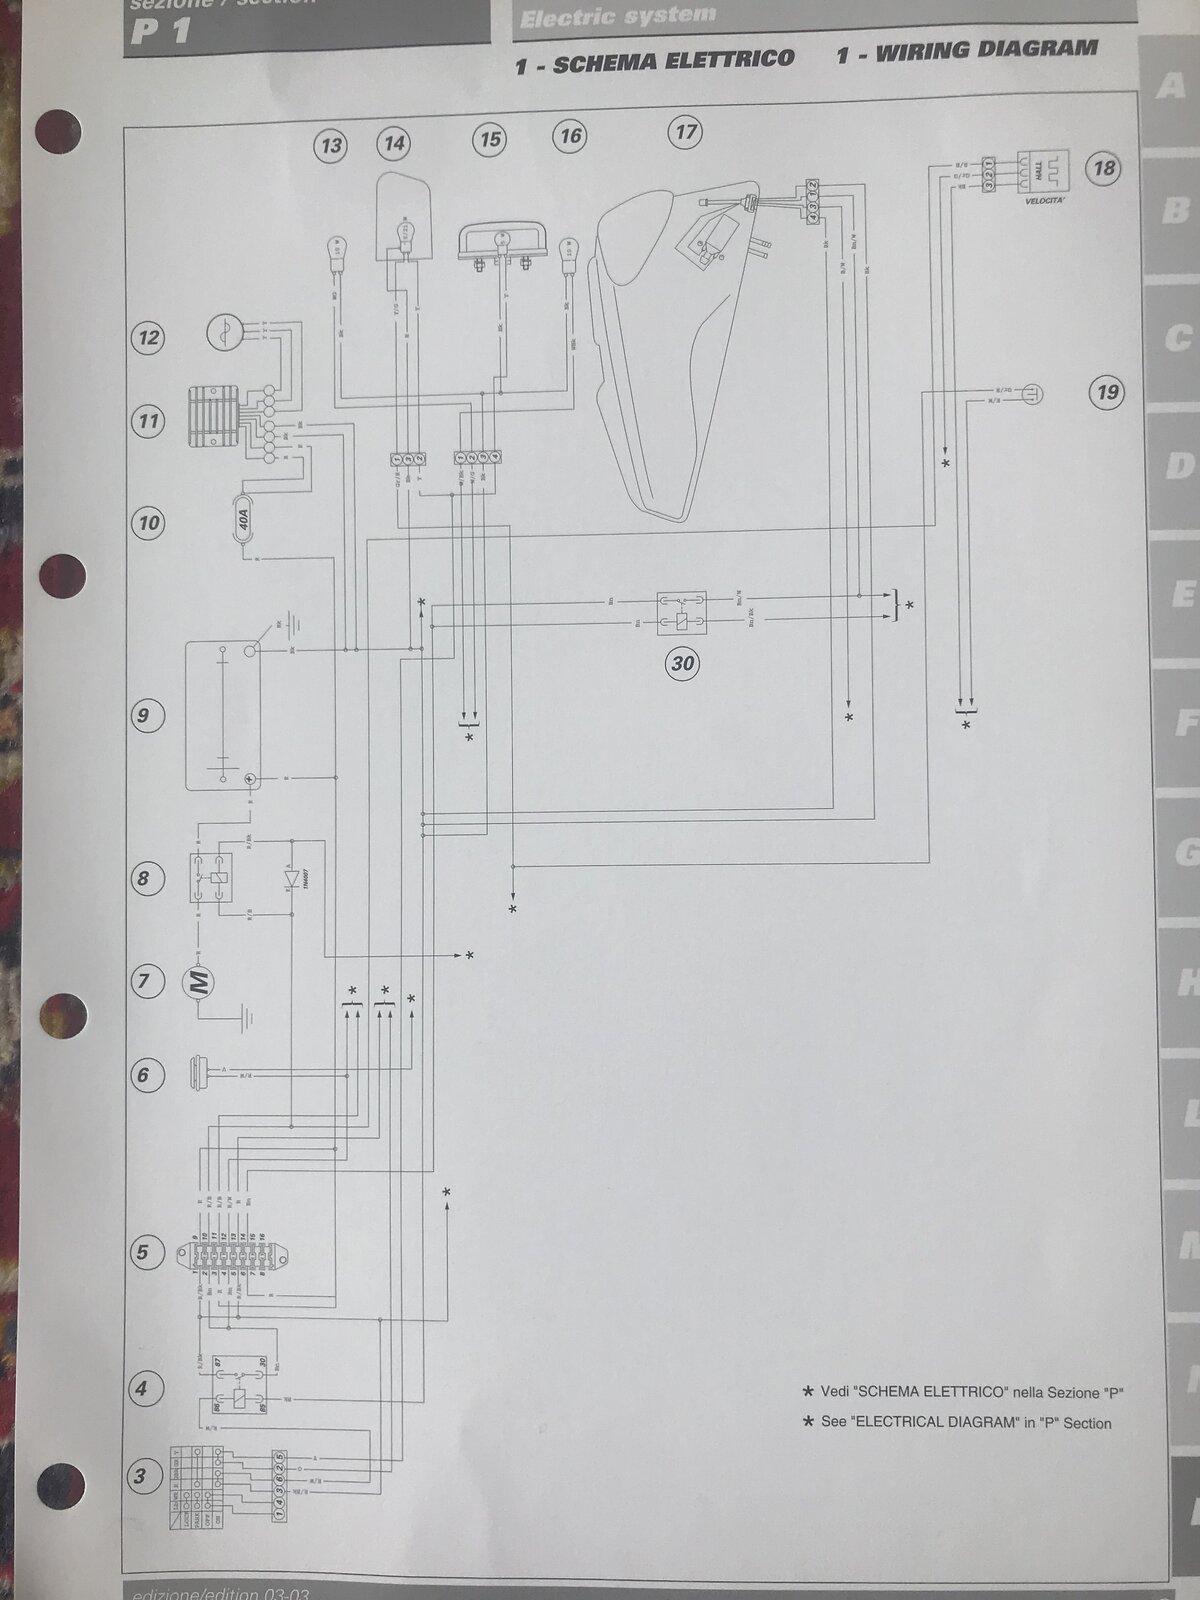 1000ss Wiring Diagram